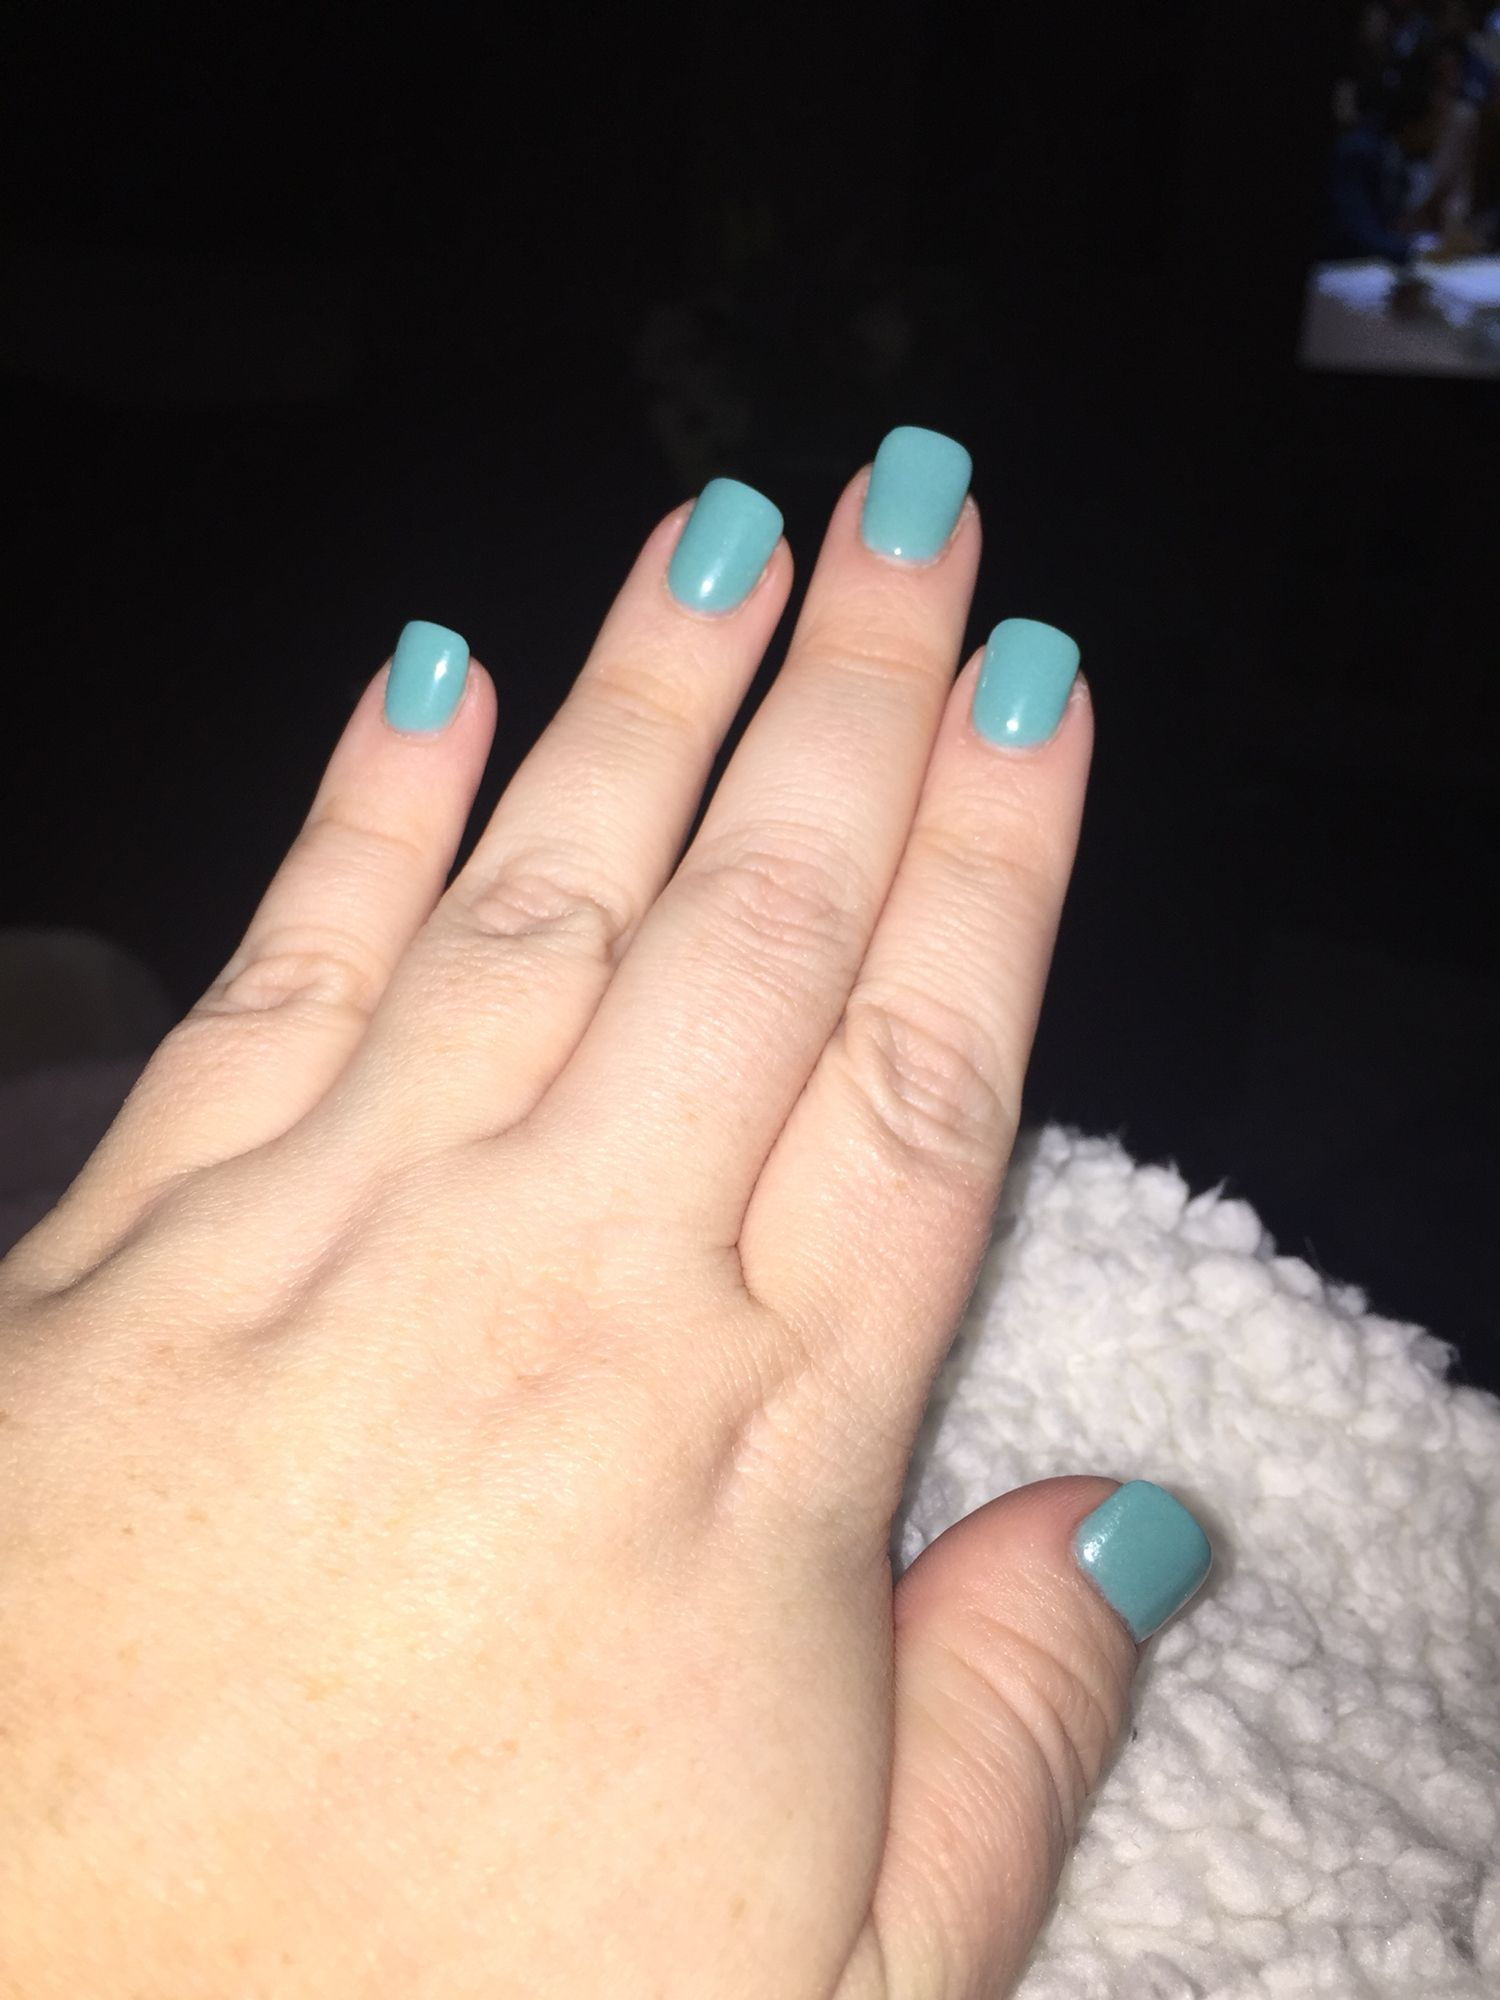 Next generation nails #nextgen #nails #tiffanyblue | Nails | Pinterest